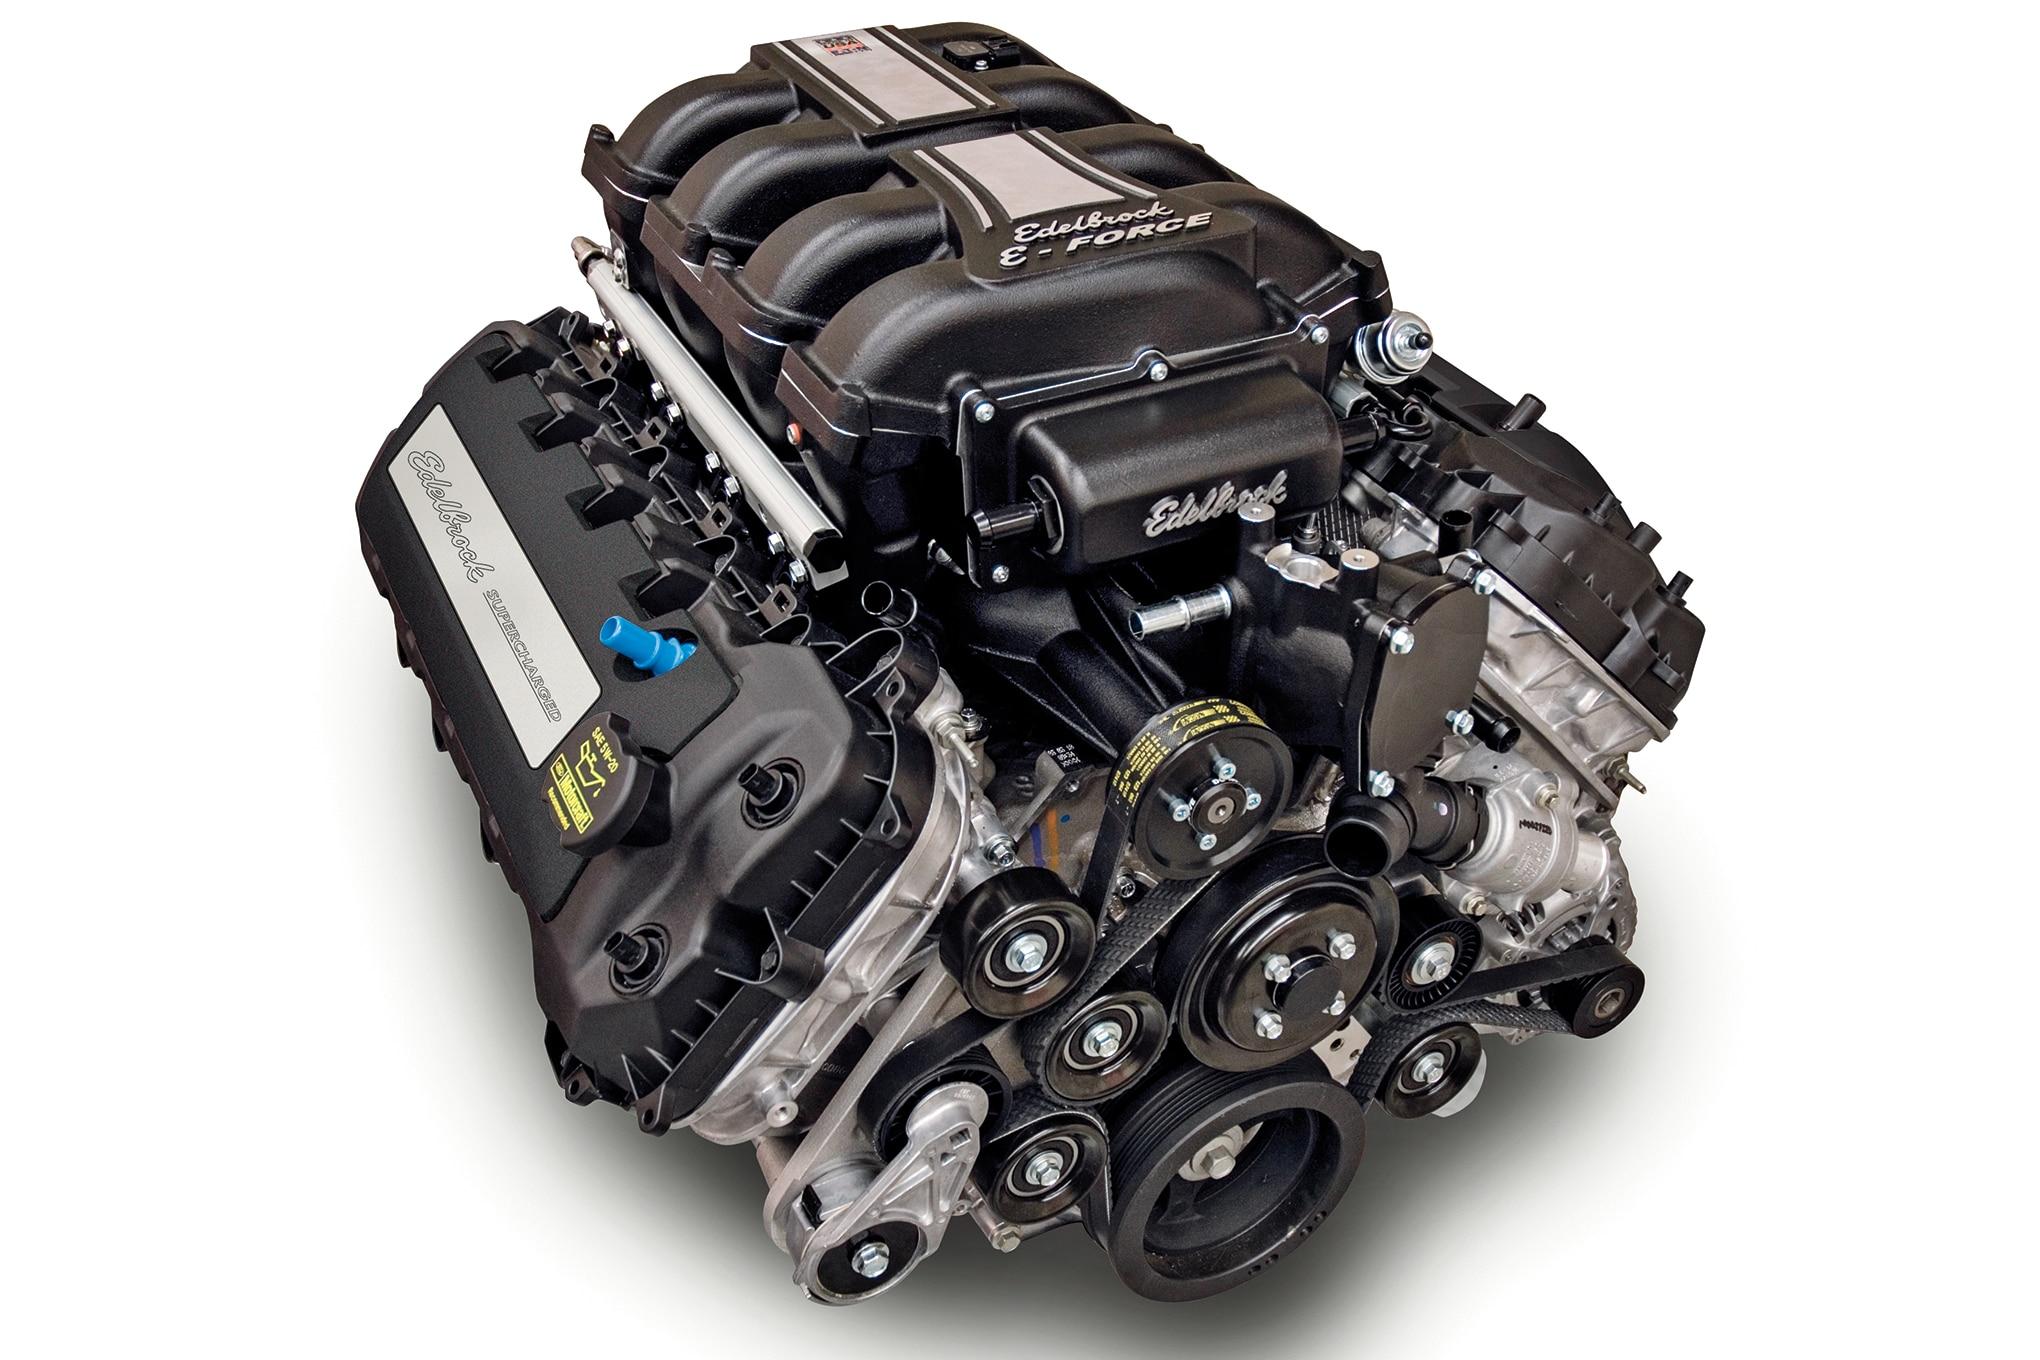 003 edelbrock e force crate engine